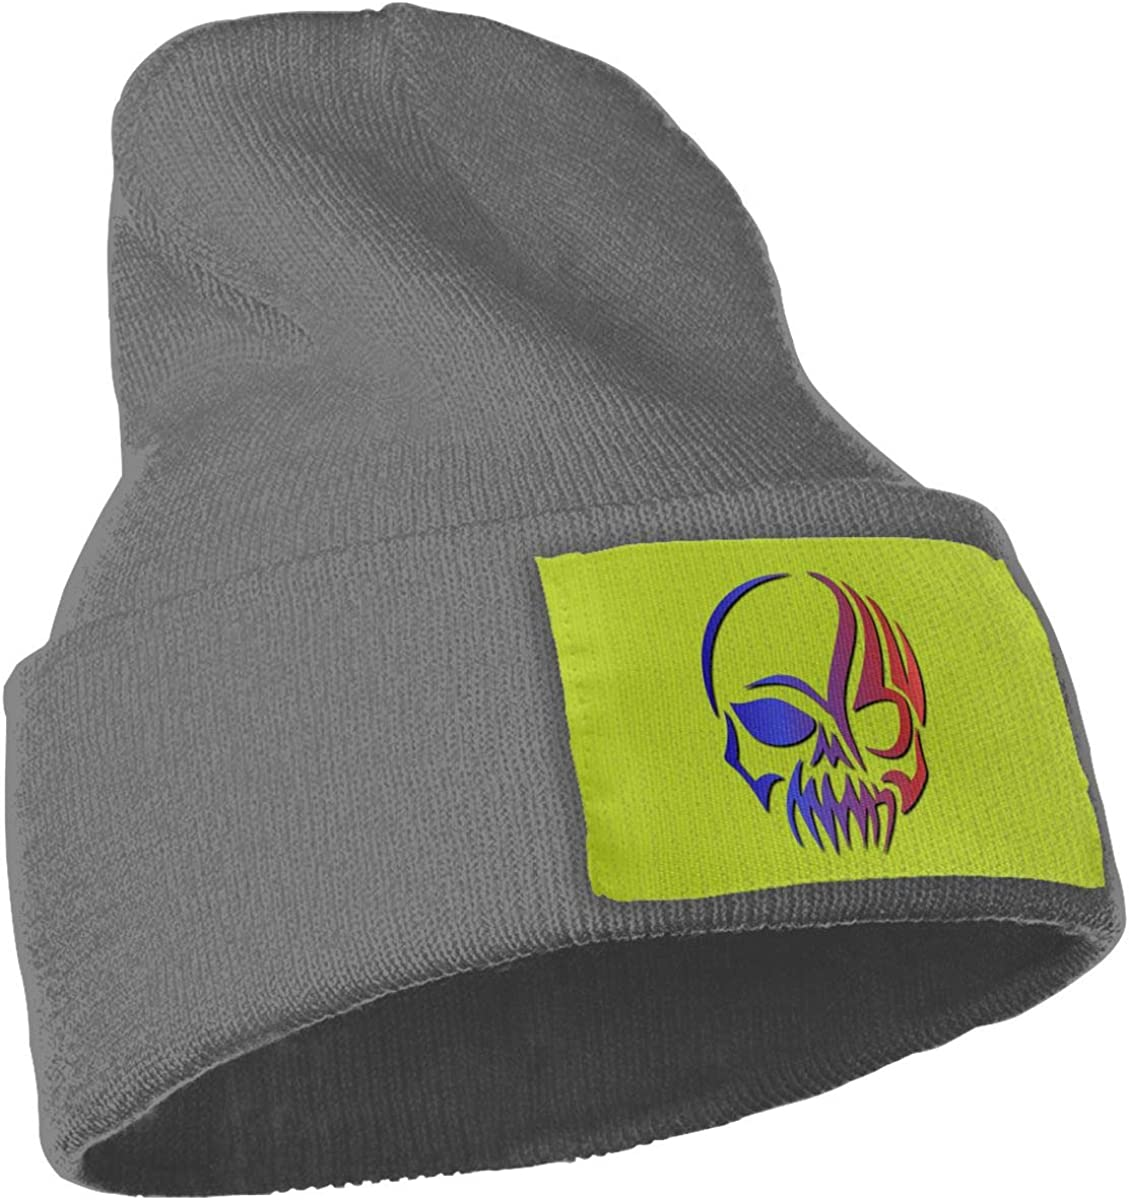 Poii Qon Blue Skull Beanies Hat Wool Knit Caps for Woman Man